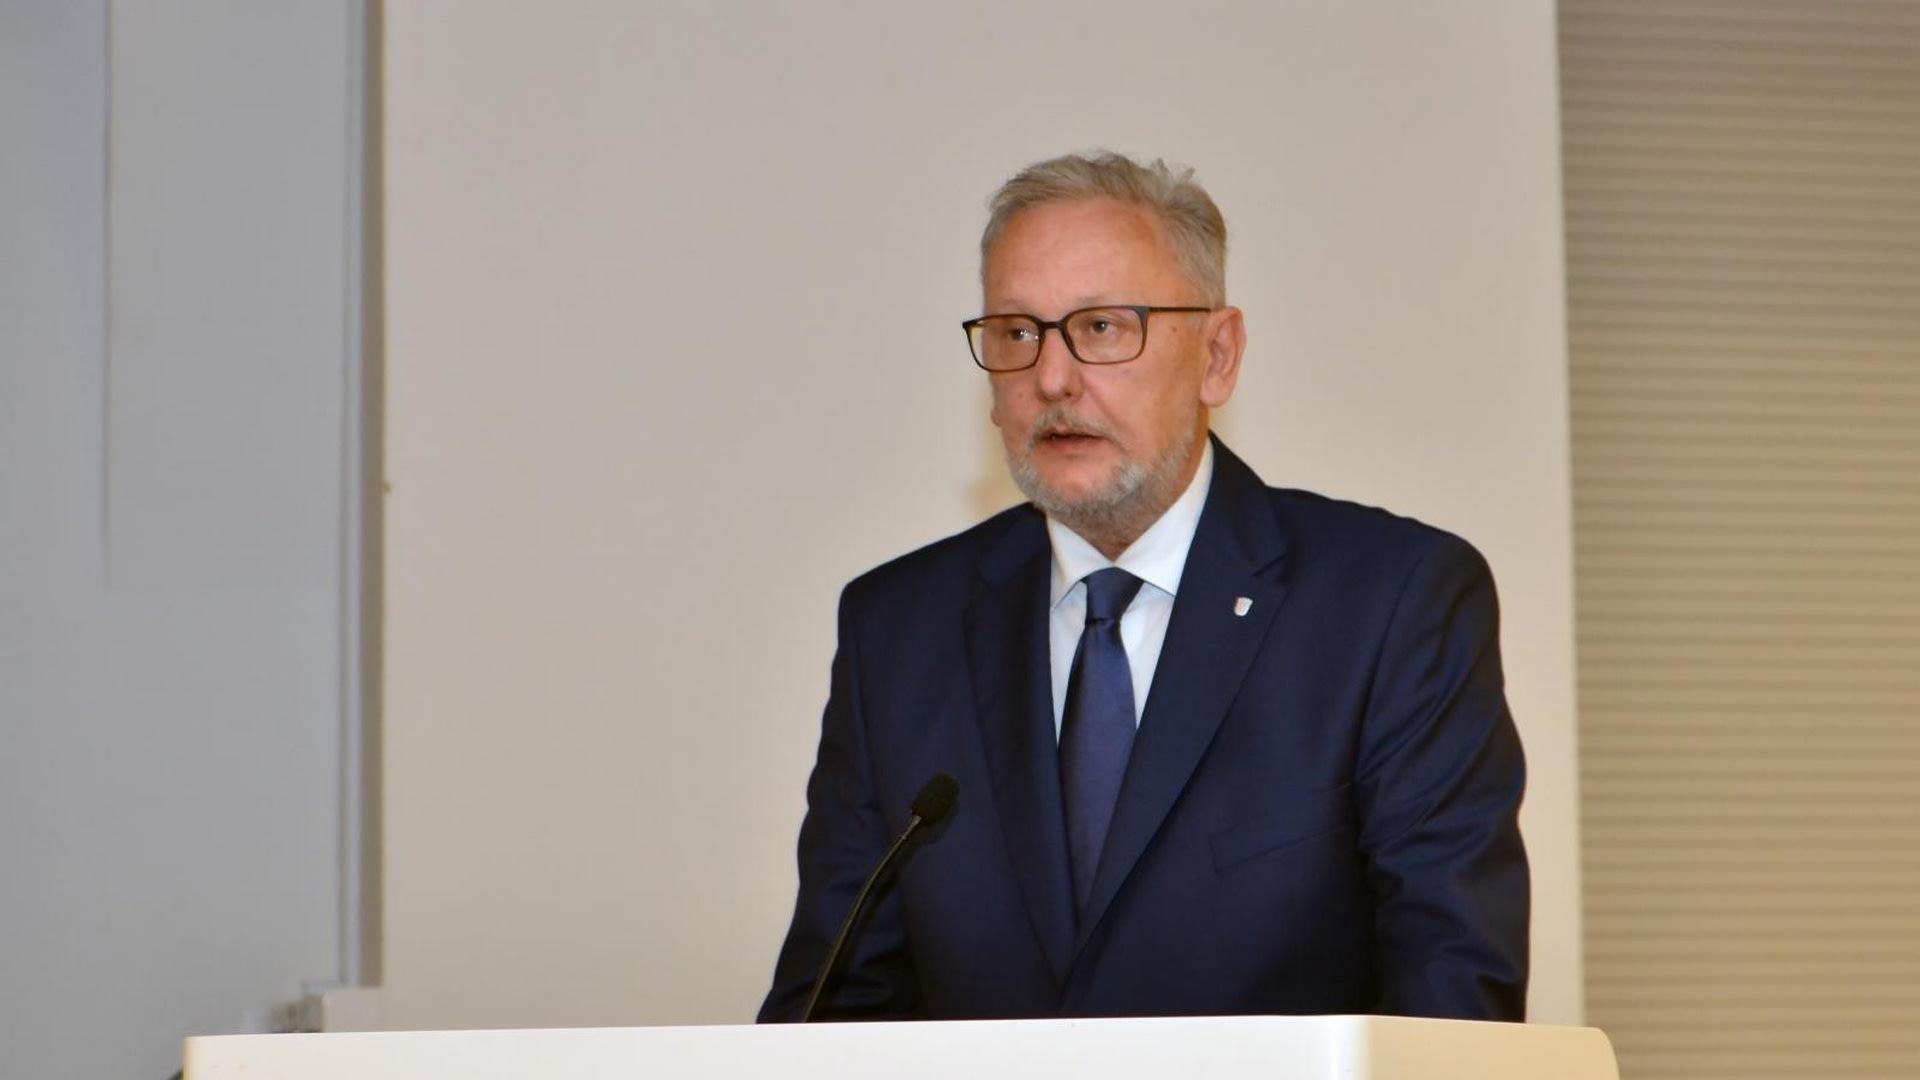 Ministro del Interior Davor Božinović. (Foto: Duško Marušić/PIXSELL)